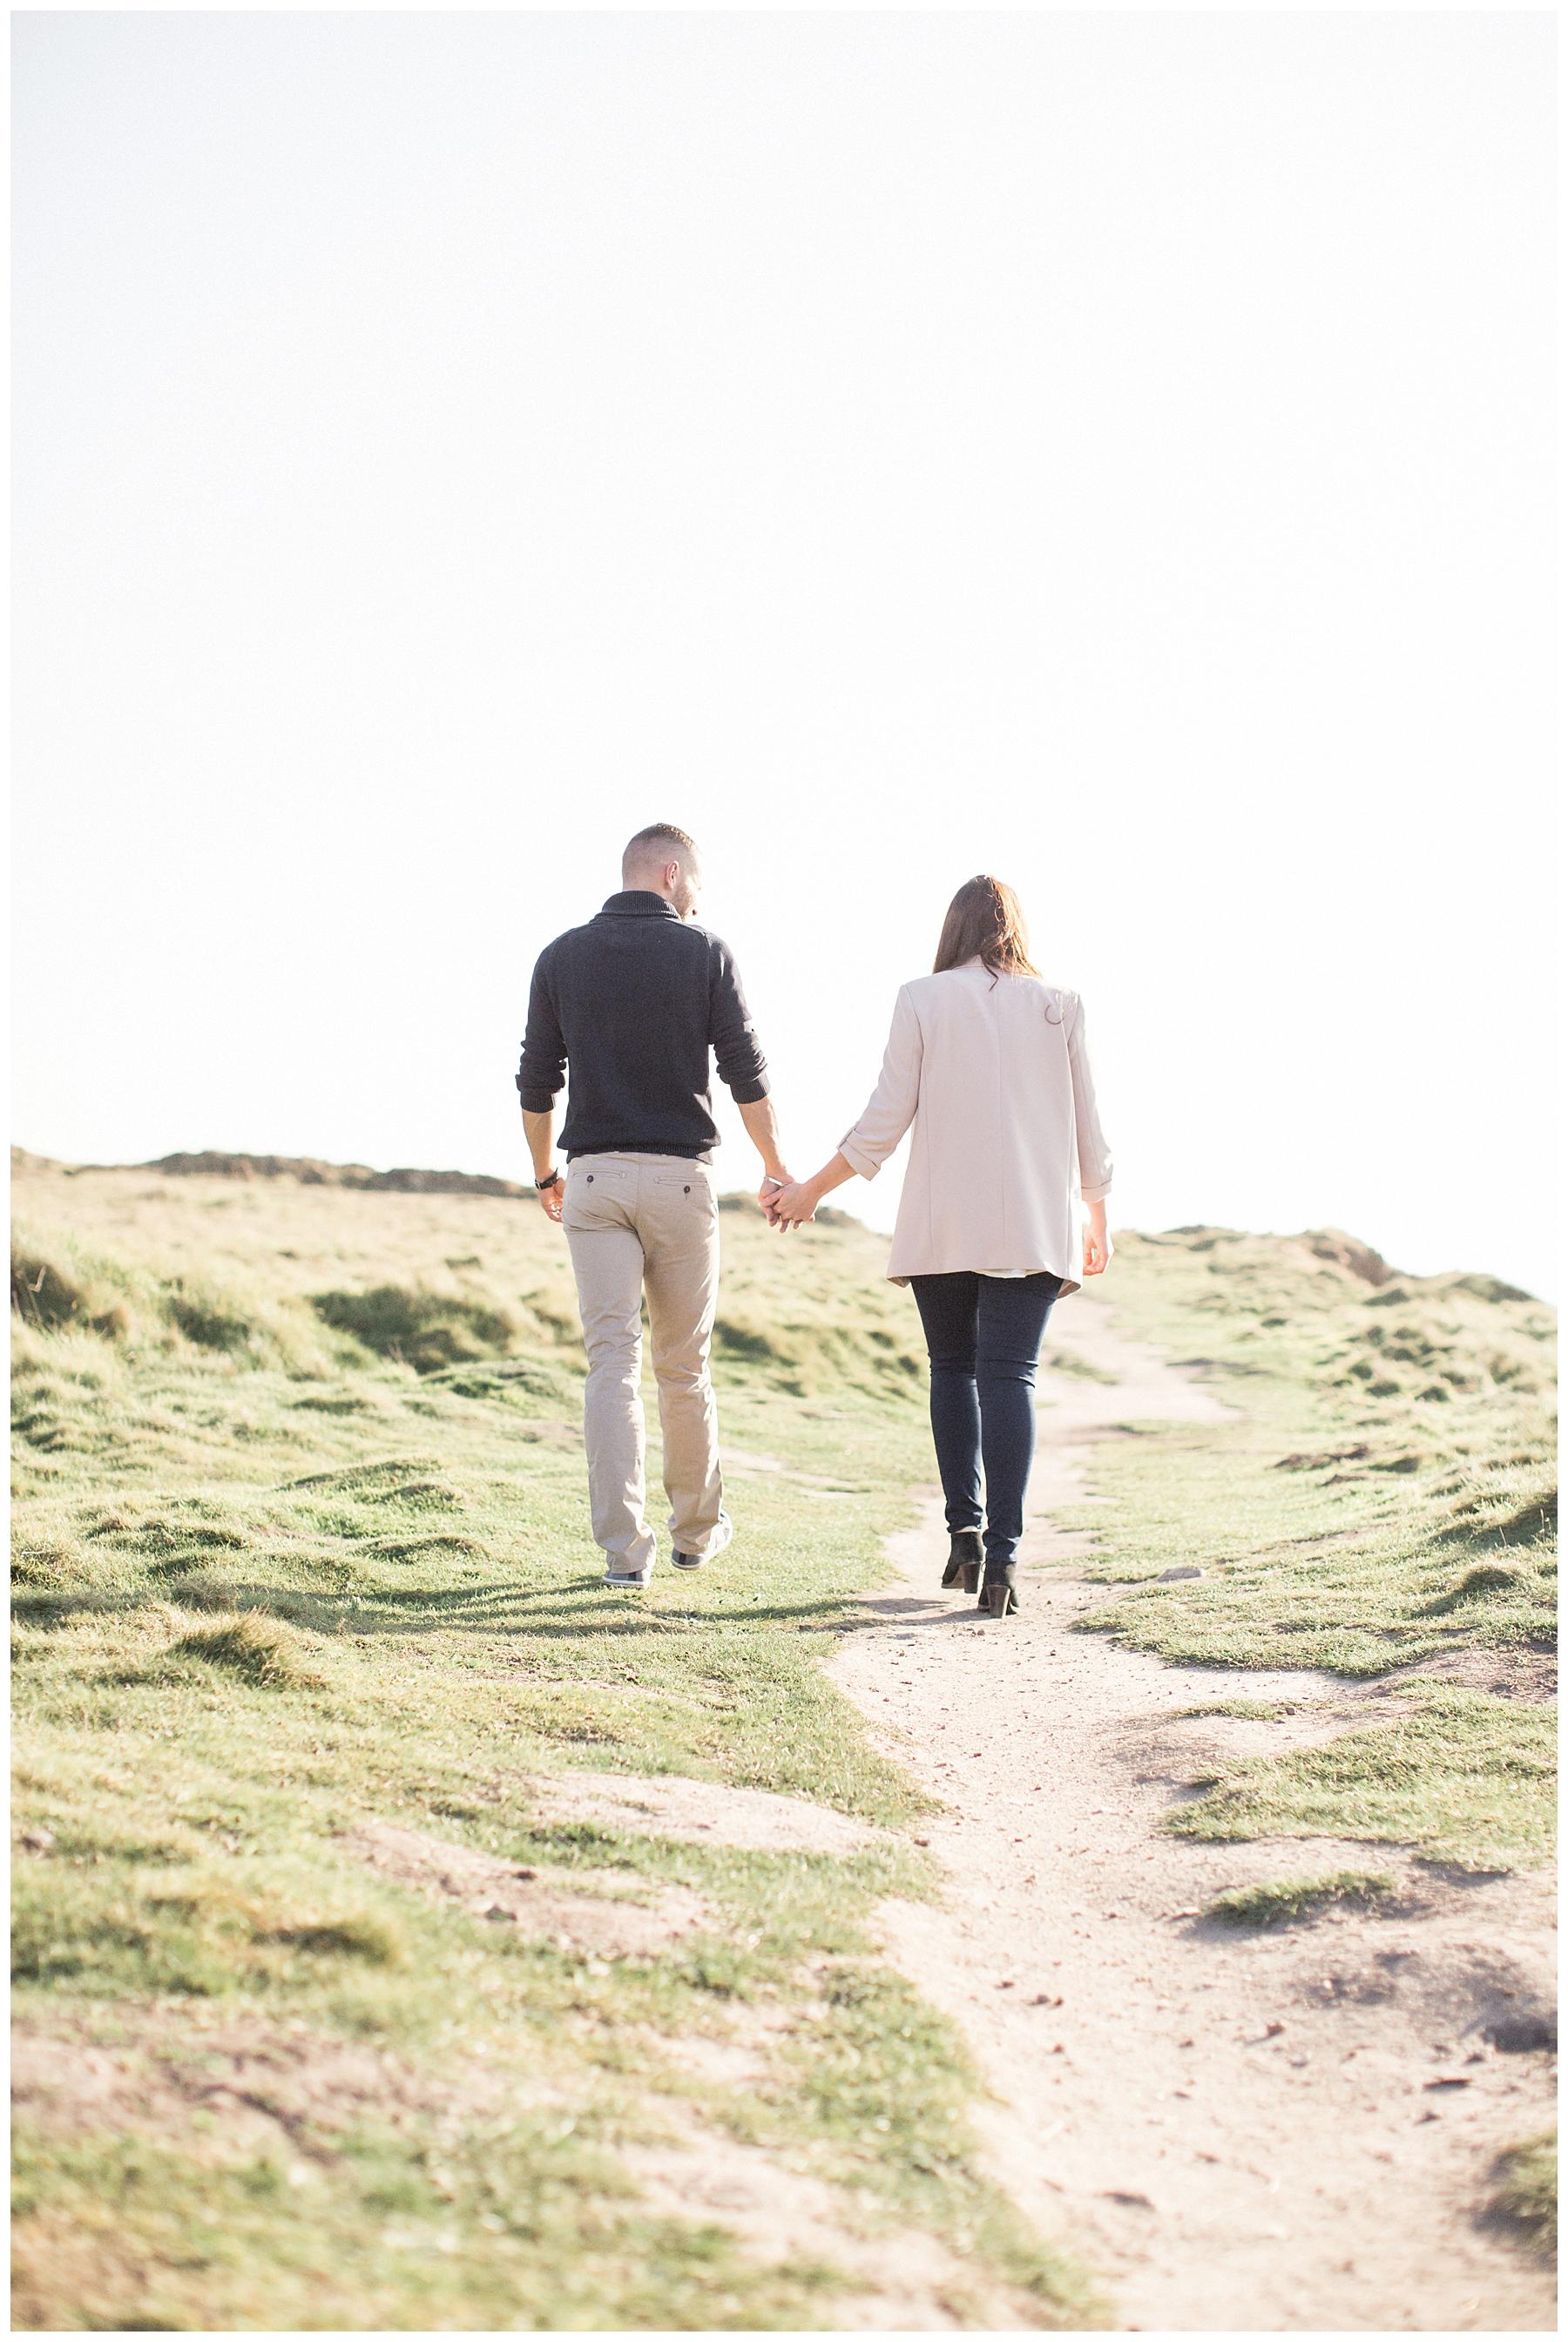 Marie-Alice G-Photographe couple fiancailles valognes cherbourg manche normandie - photographe mariage france_0018